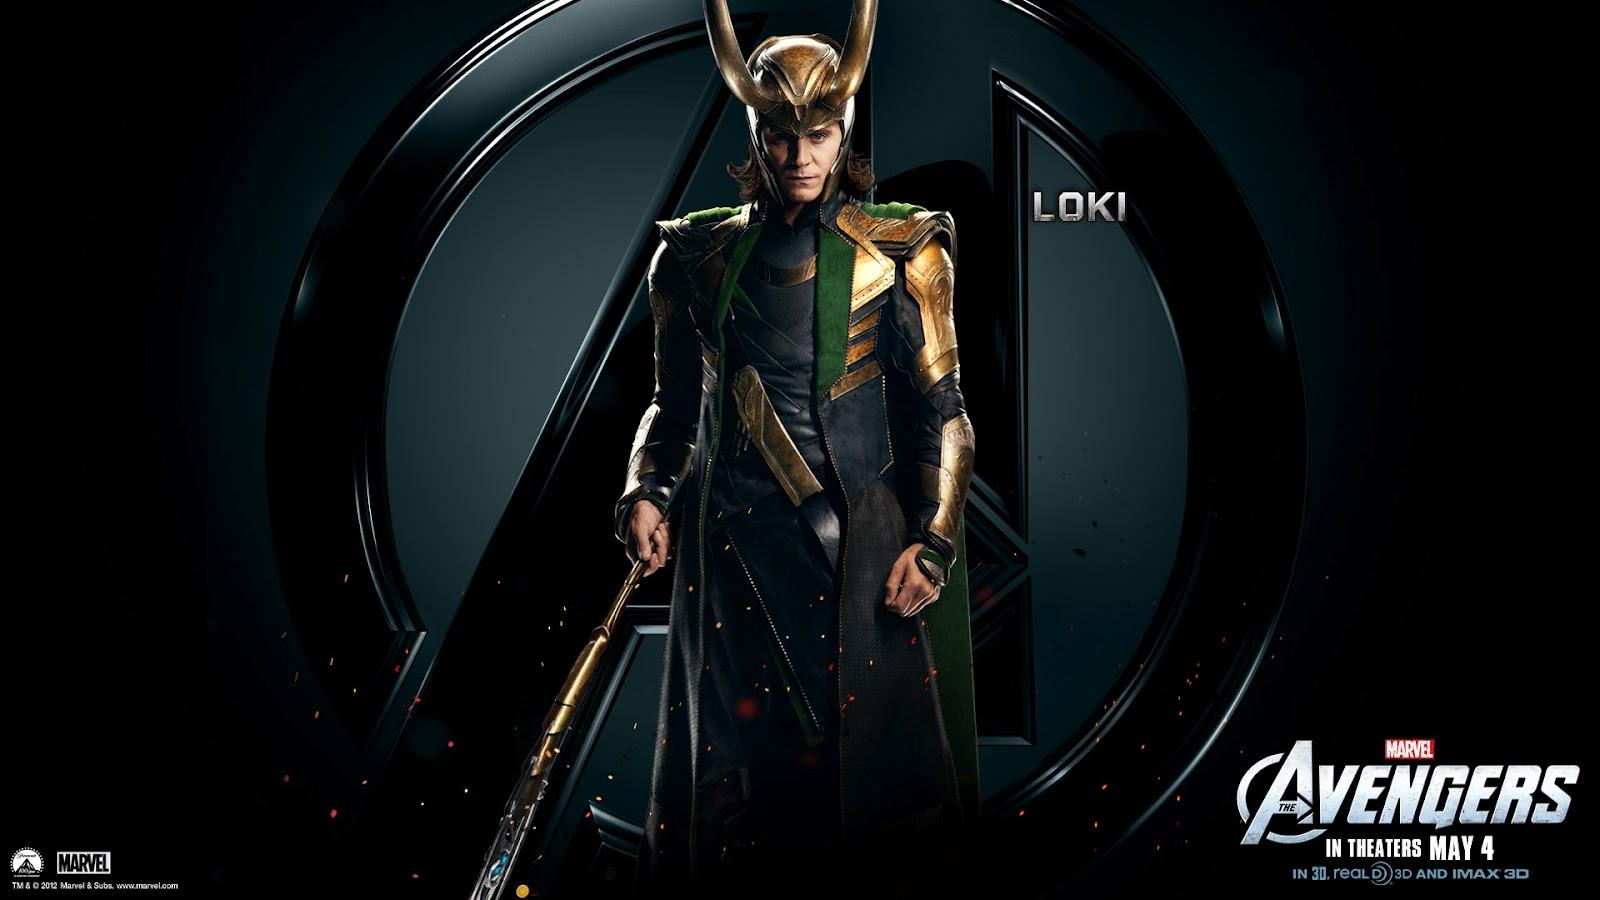 Avengers Wallpapers HD The Avengers Villain Loki HD Wallpapers 1600x900